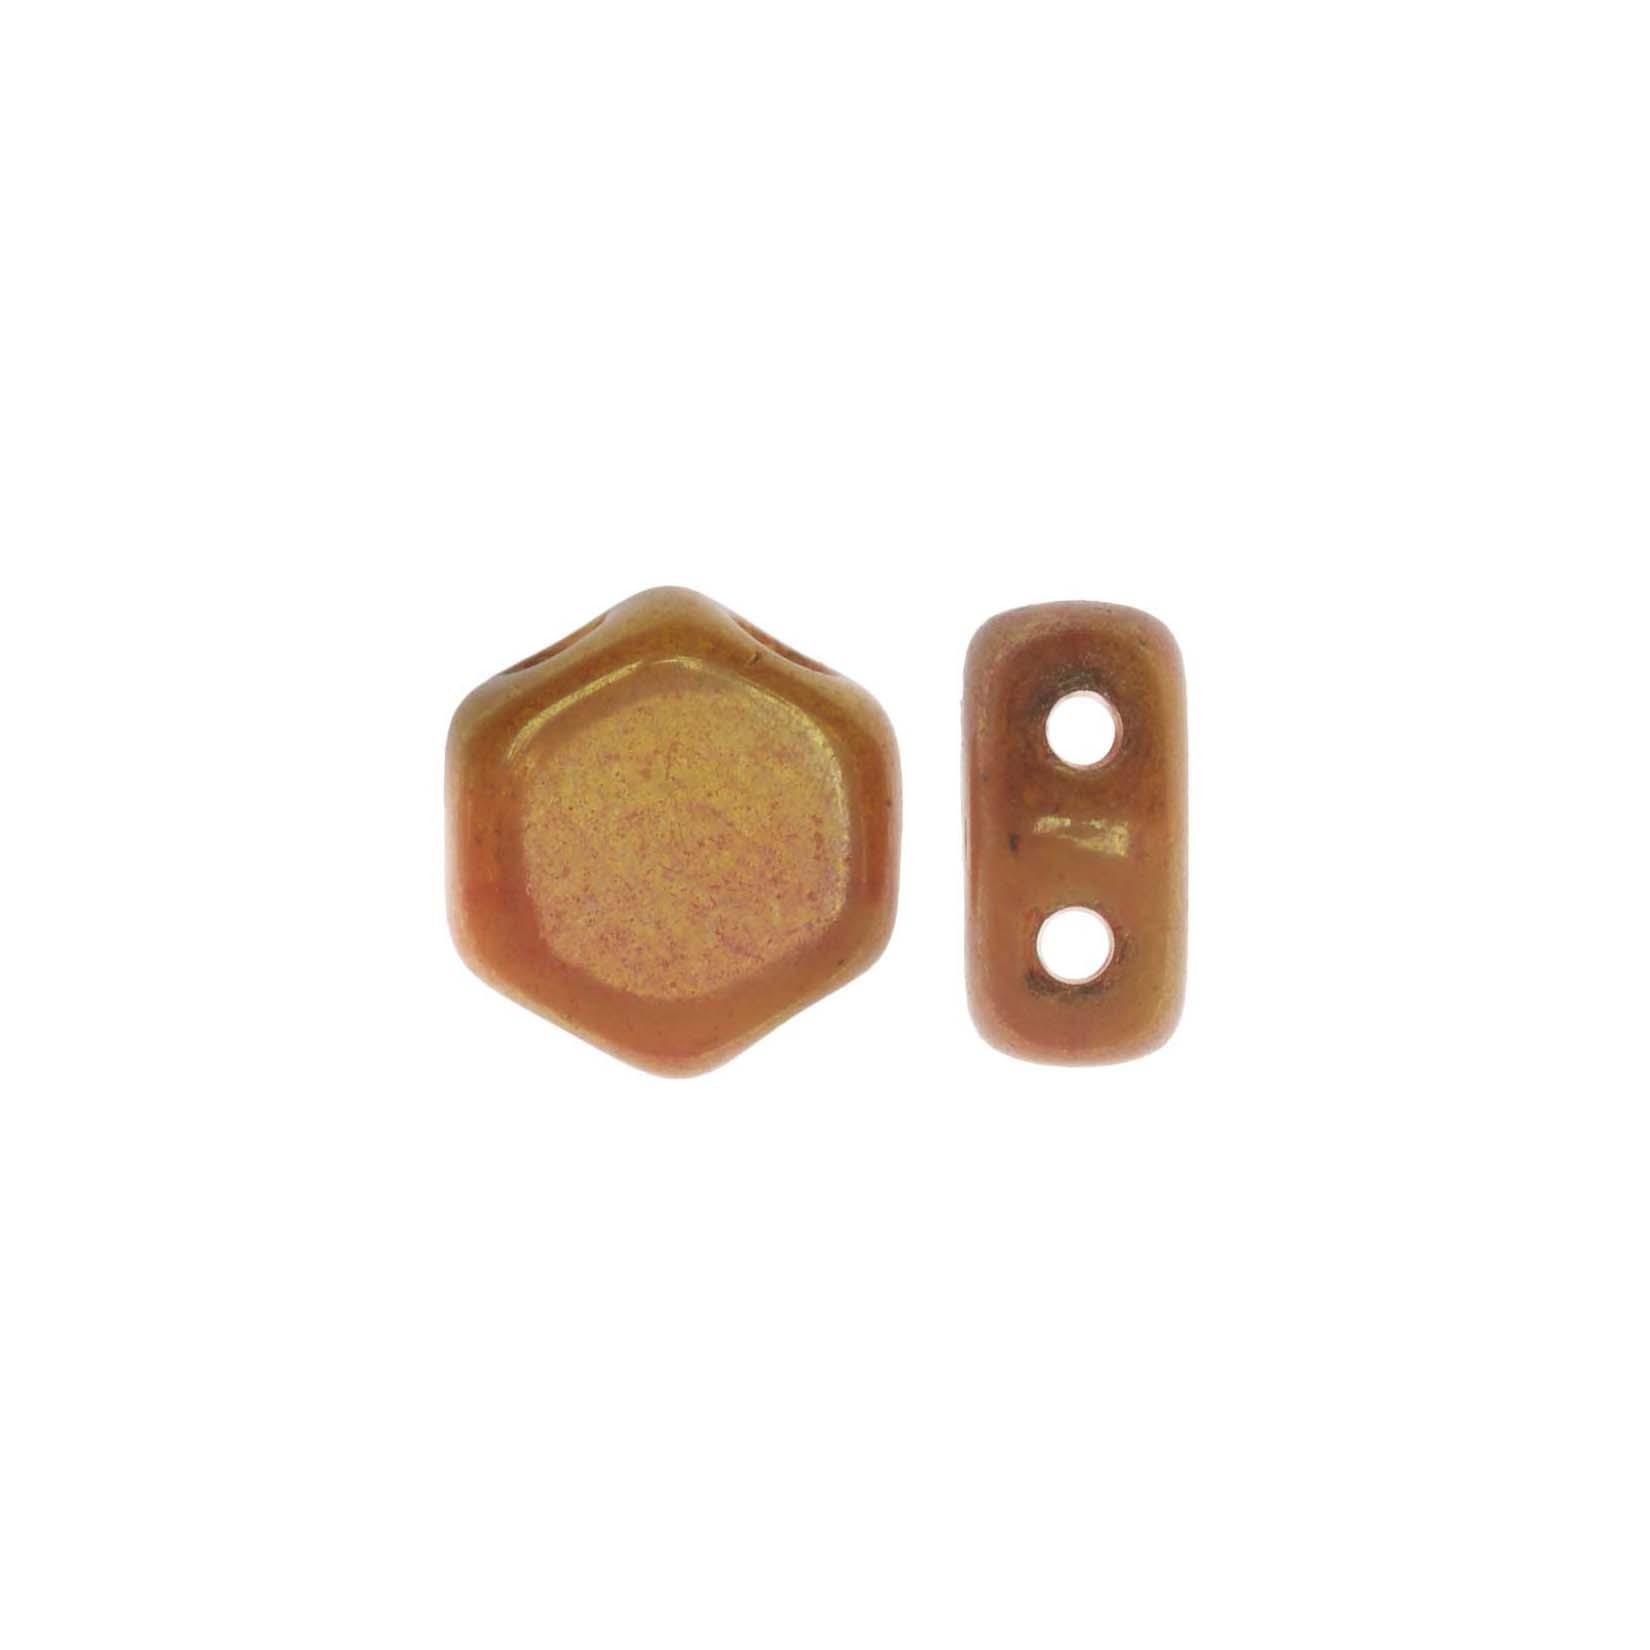 Czech Glass Honeycomb Beads, 2-Hole Hexagon 6mm, 30 Pieces, Hodge Podge Orange Luster